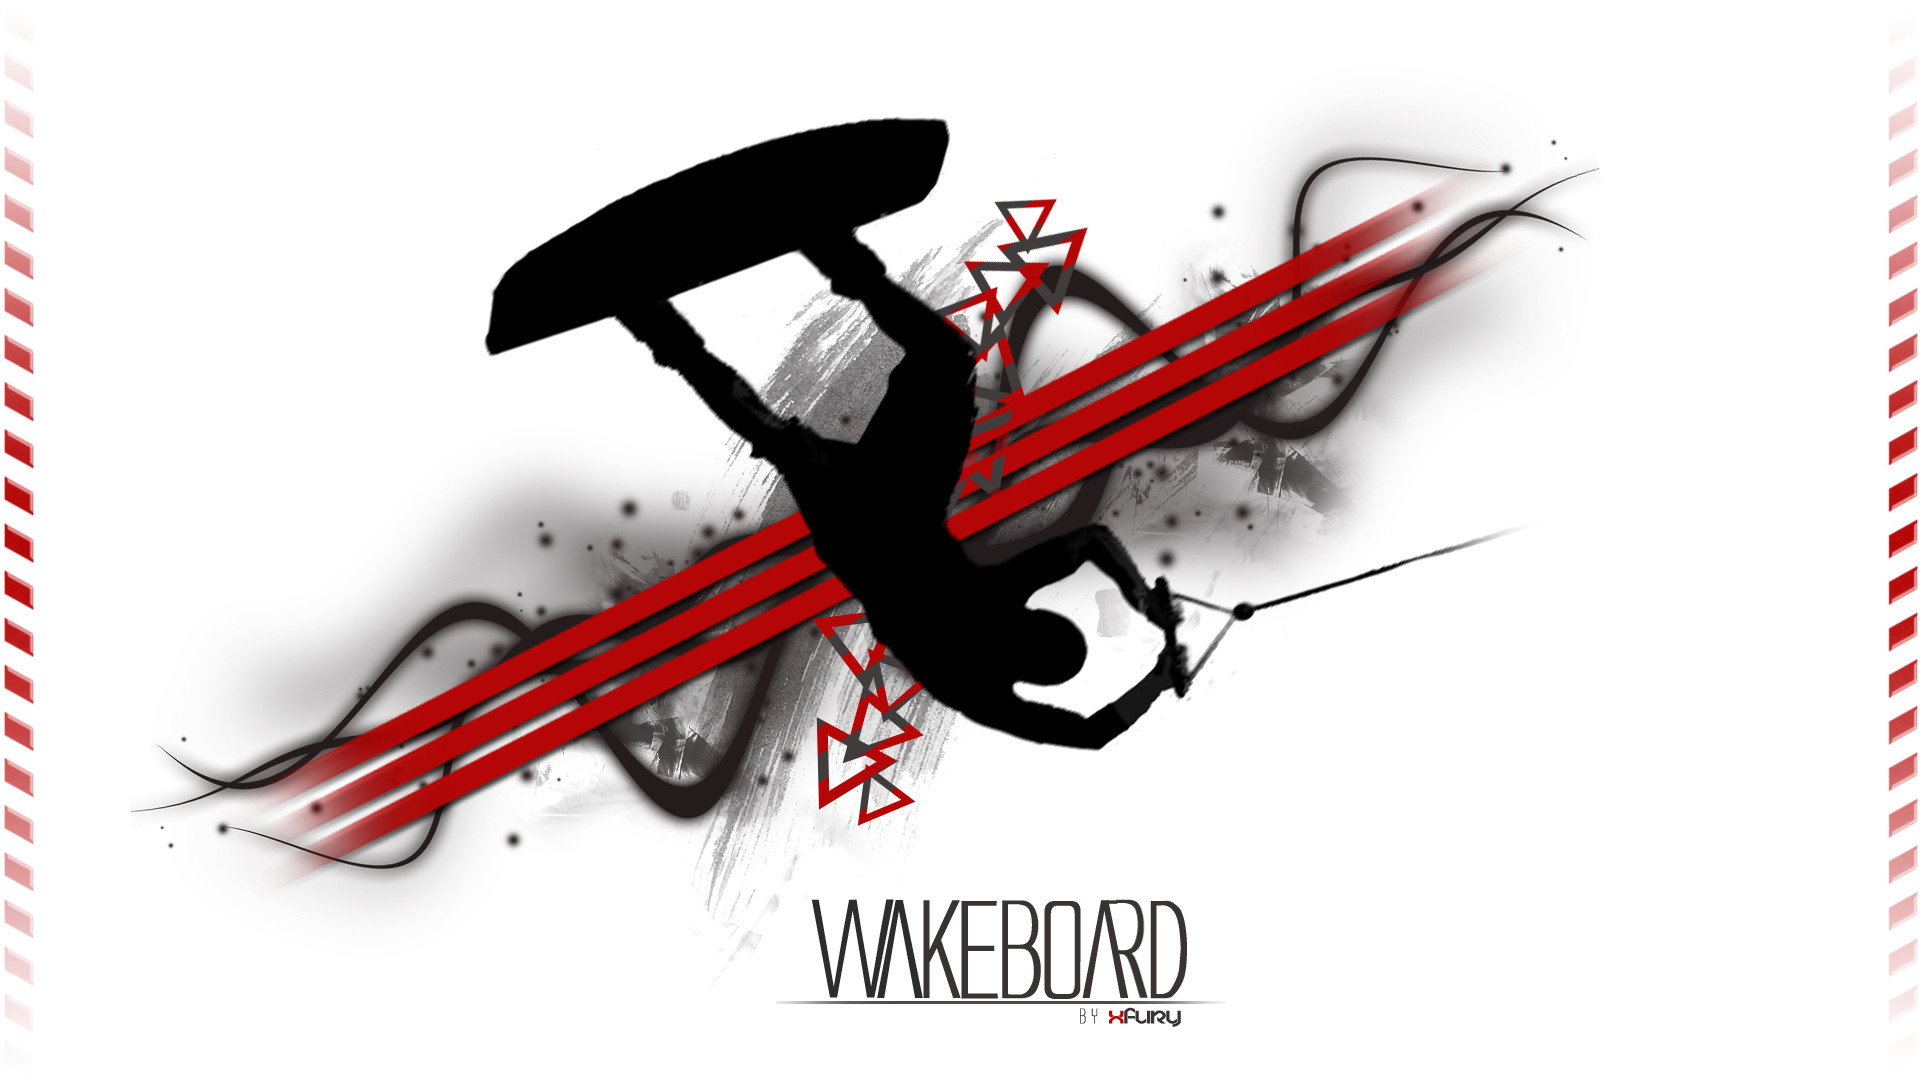 Wakeboard by GG-xFury Wakeboard by GG-xFury